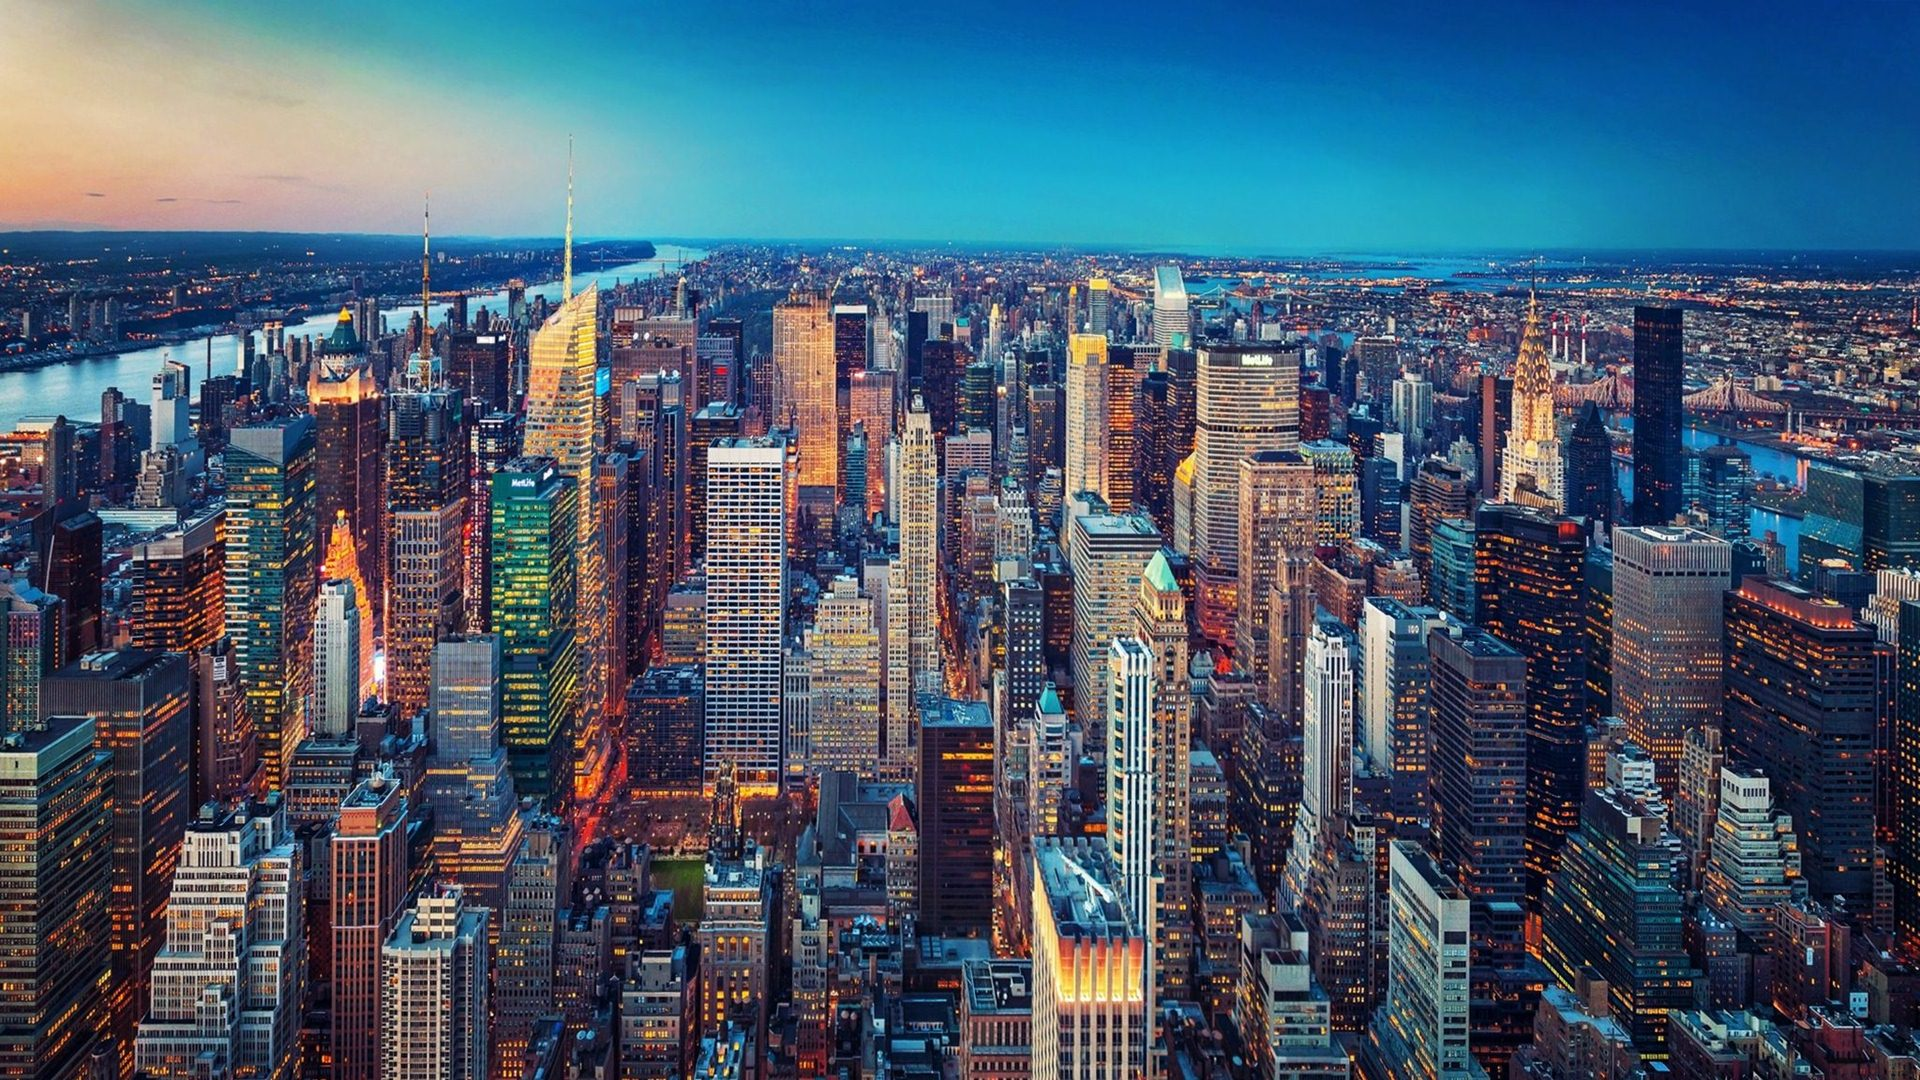 hd new york city usa background background 43710 hd new york city usa 1920x1080